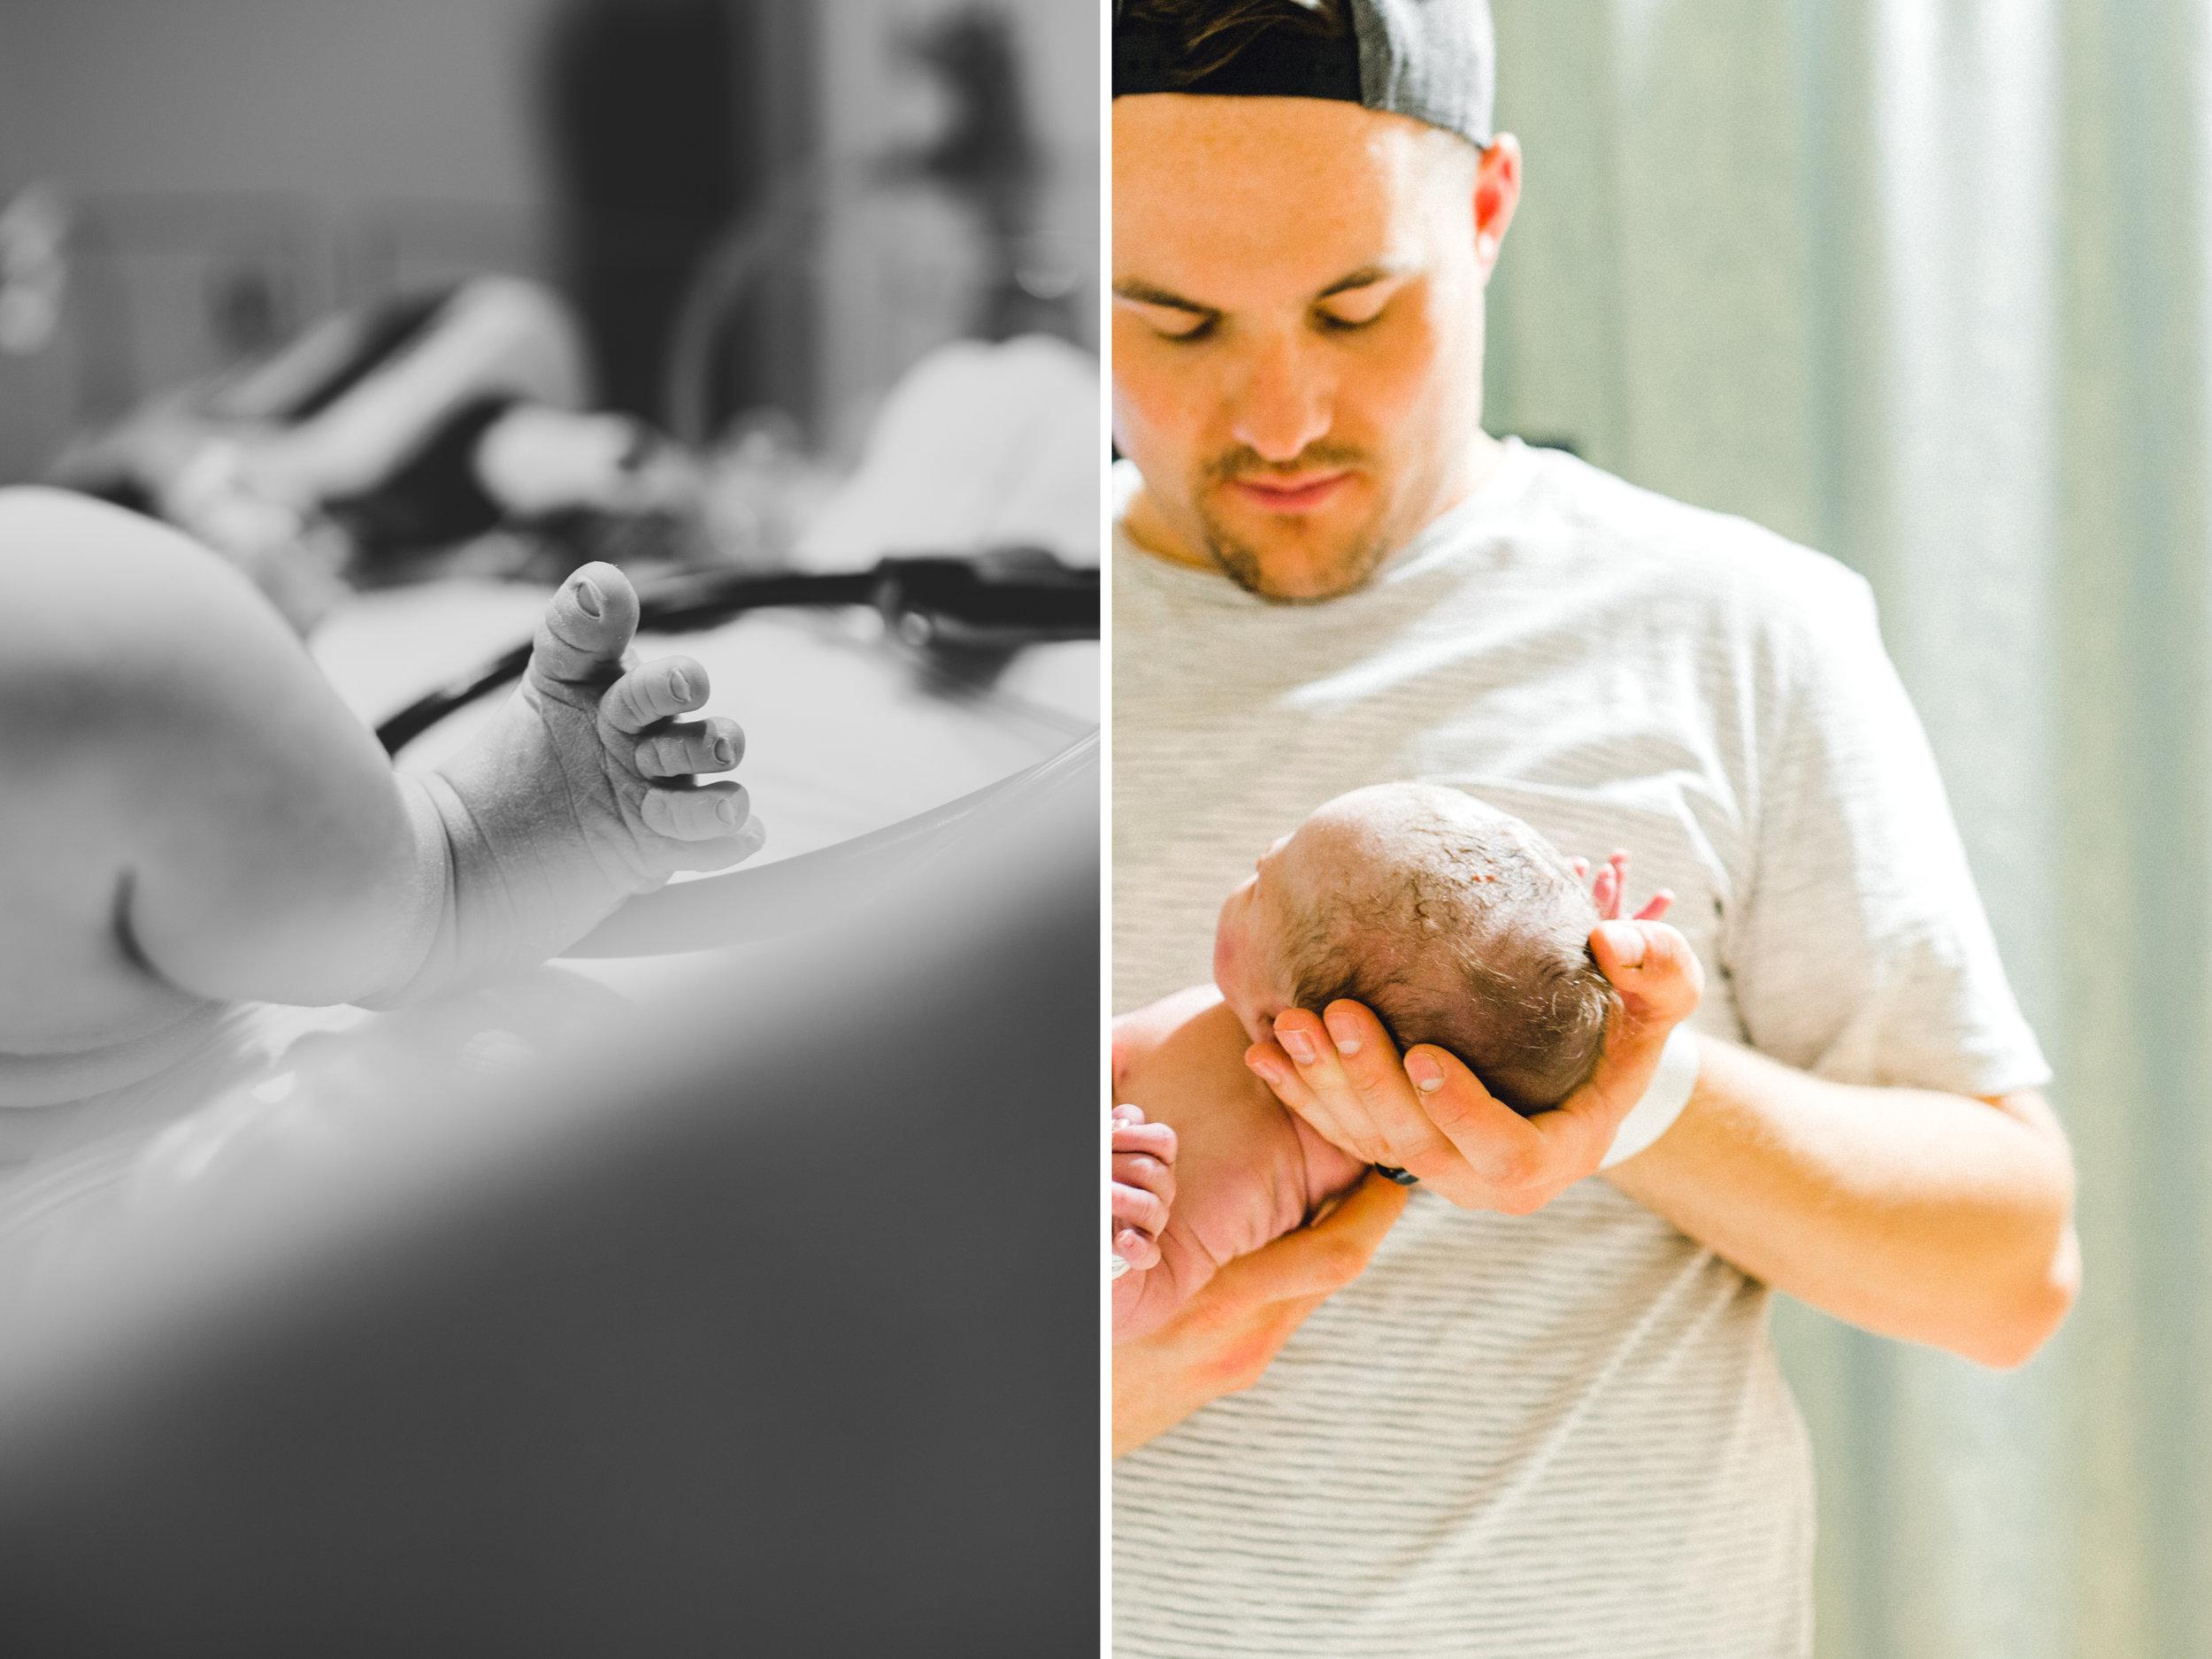 rexburg-idaho-birth-photographer-anna-christine-photo6.jpg